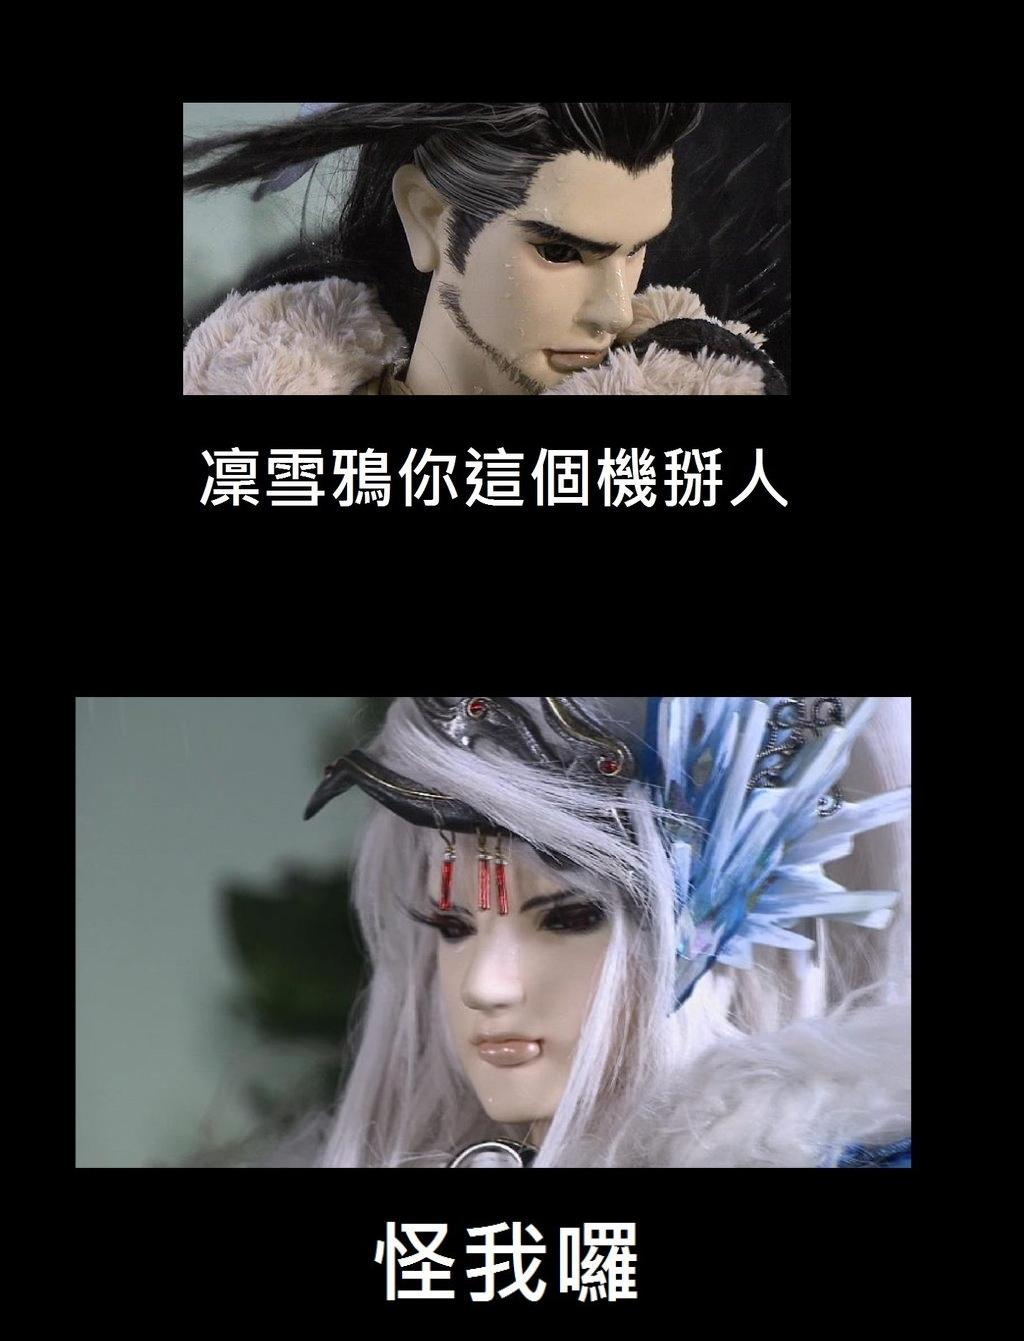 [Spiritus Tarou] (Nise) Nemurihime   (Pretend) Sleeping Princess (COMIC BAVEL 2016-04) [Chinese] [穿越鬼歿之地千里迢迢來東離買燒餅卻被雞掰人拐去搞麻煩事崩潰不已西幽組] 7